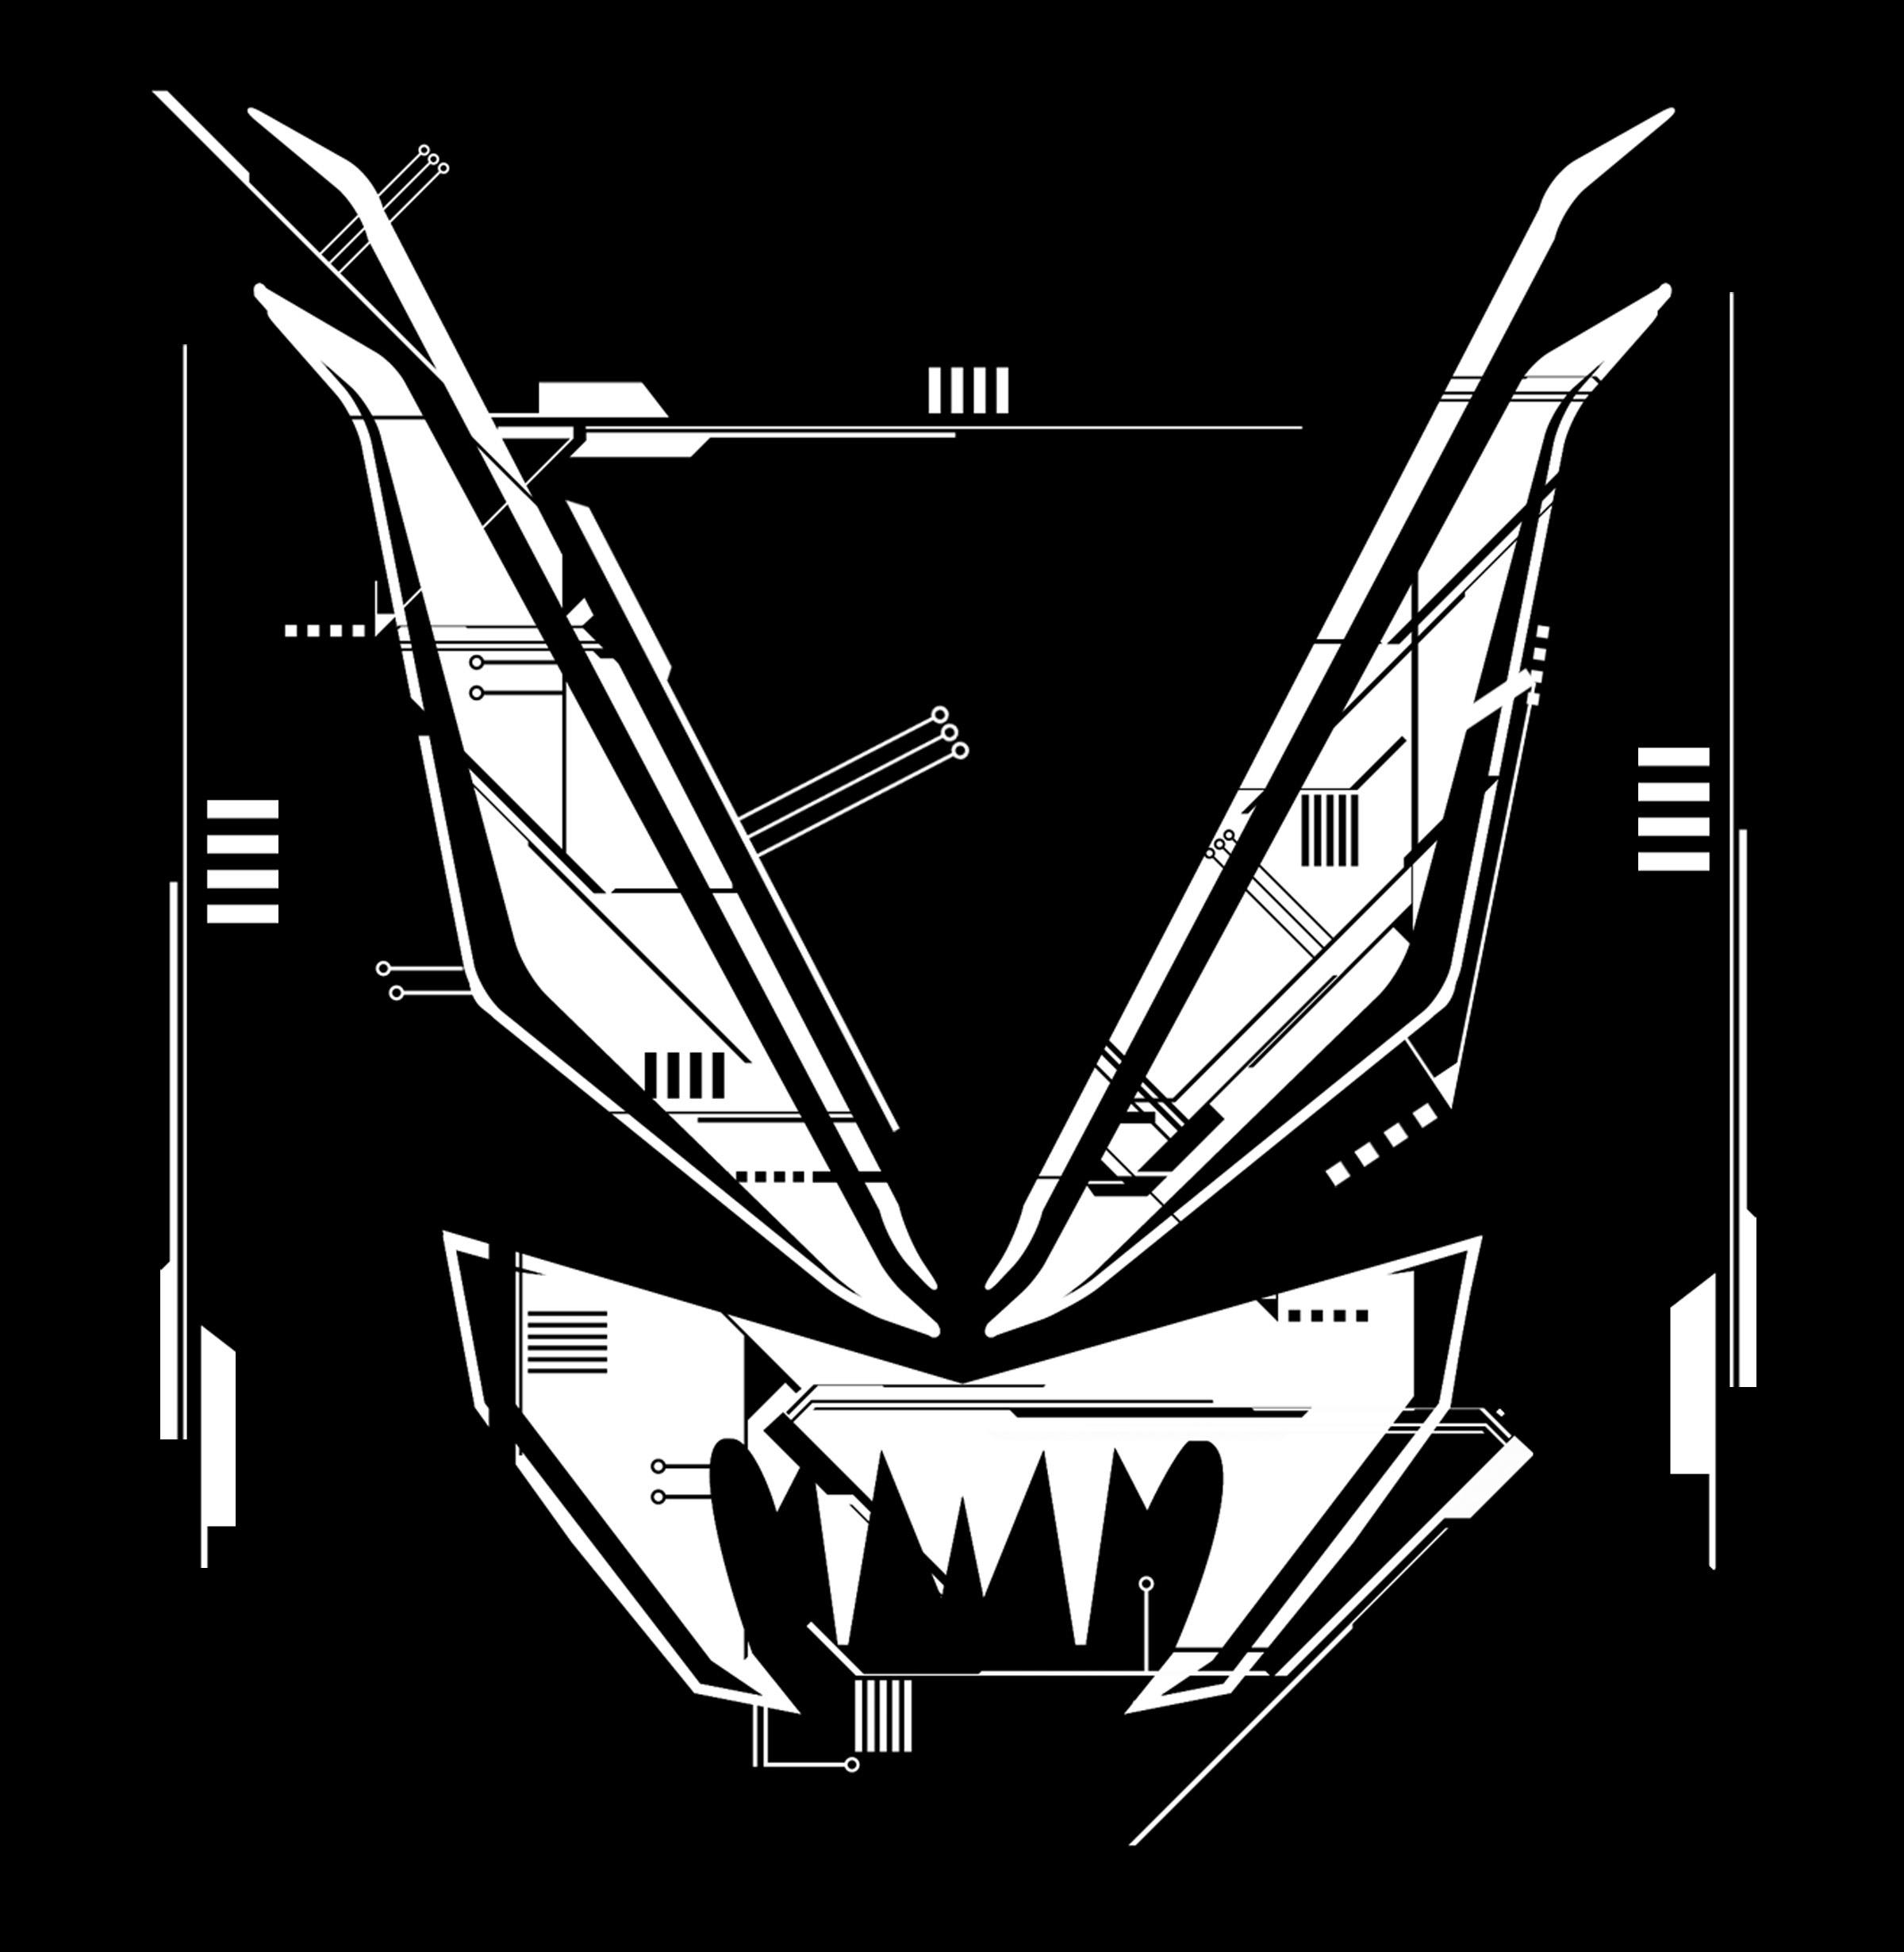 vf_digital_tshirt_front